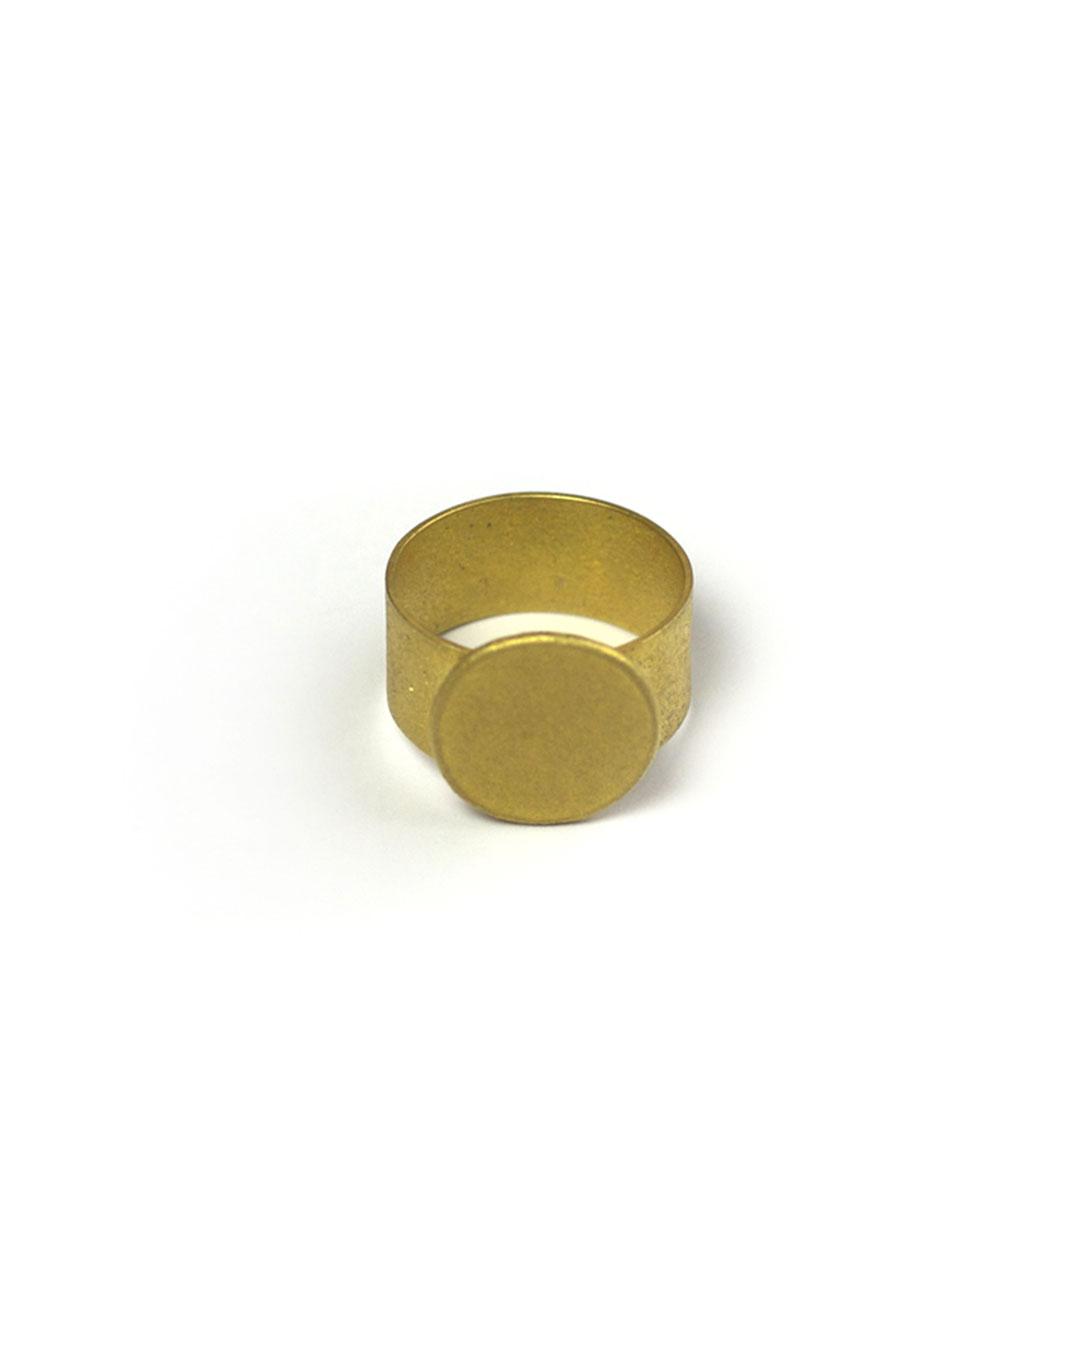 Karin Johansson, untitled, 2010, ring; 18ct gold, 21 x 19 x 19 mm, €2100